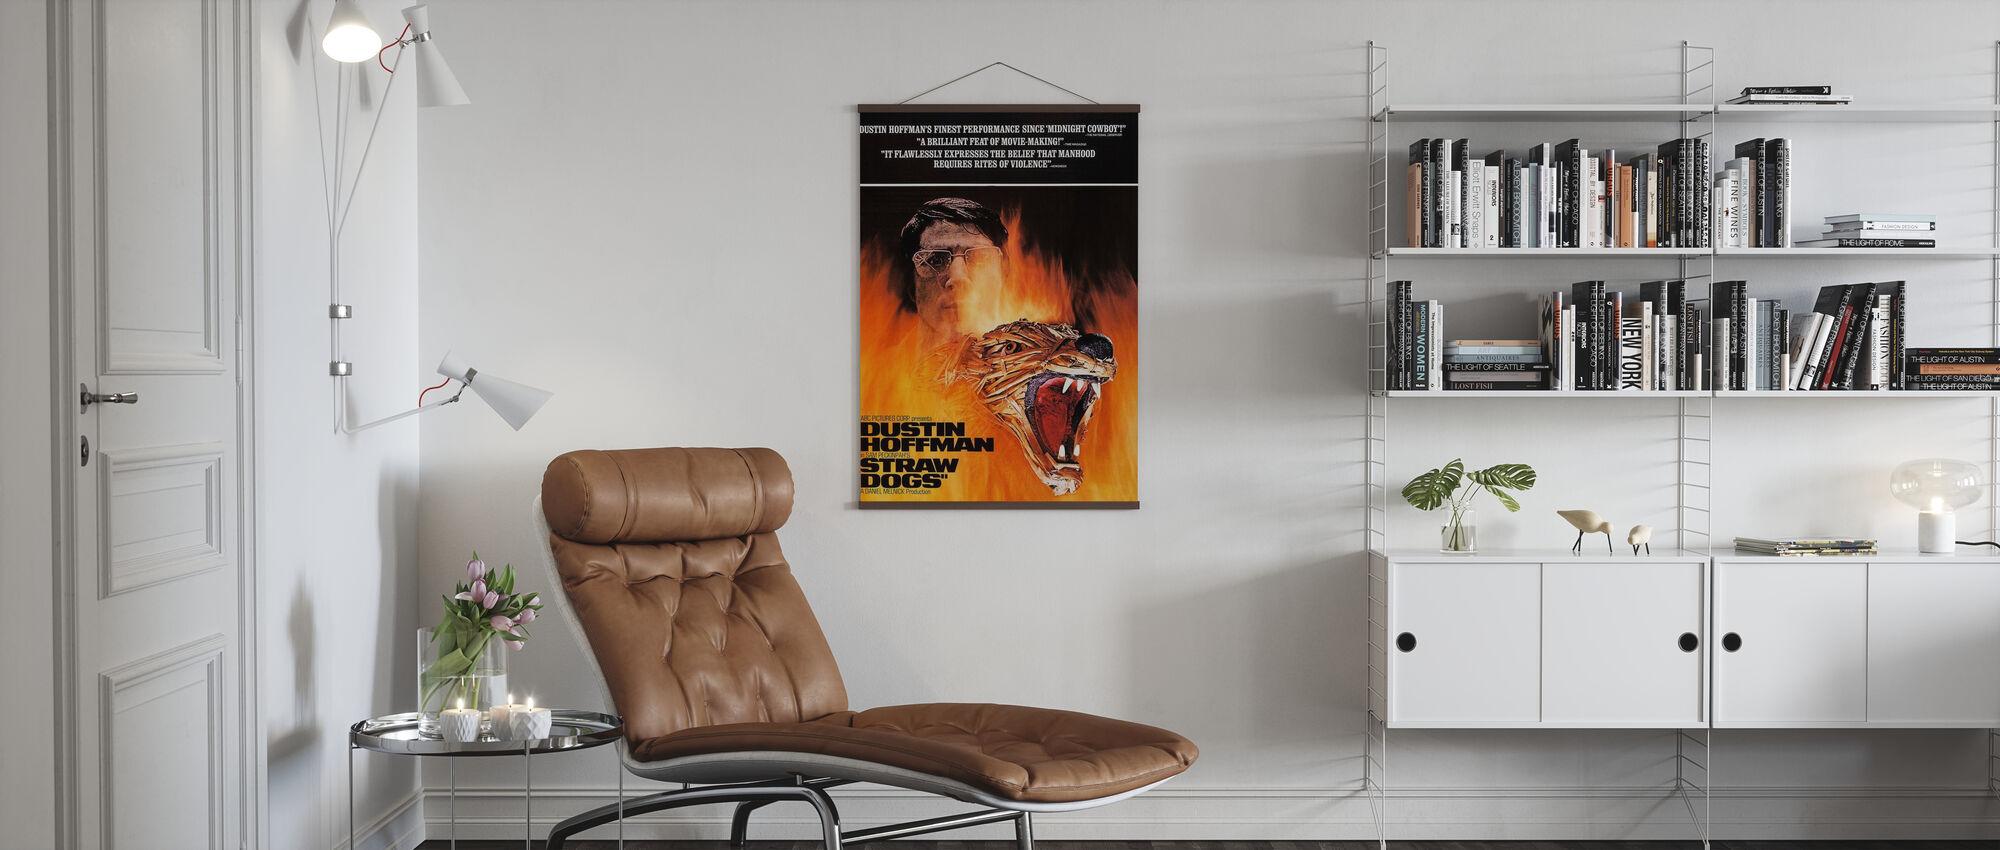 Stro Honden - Poster - Woonkamer